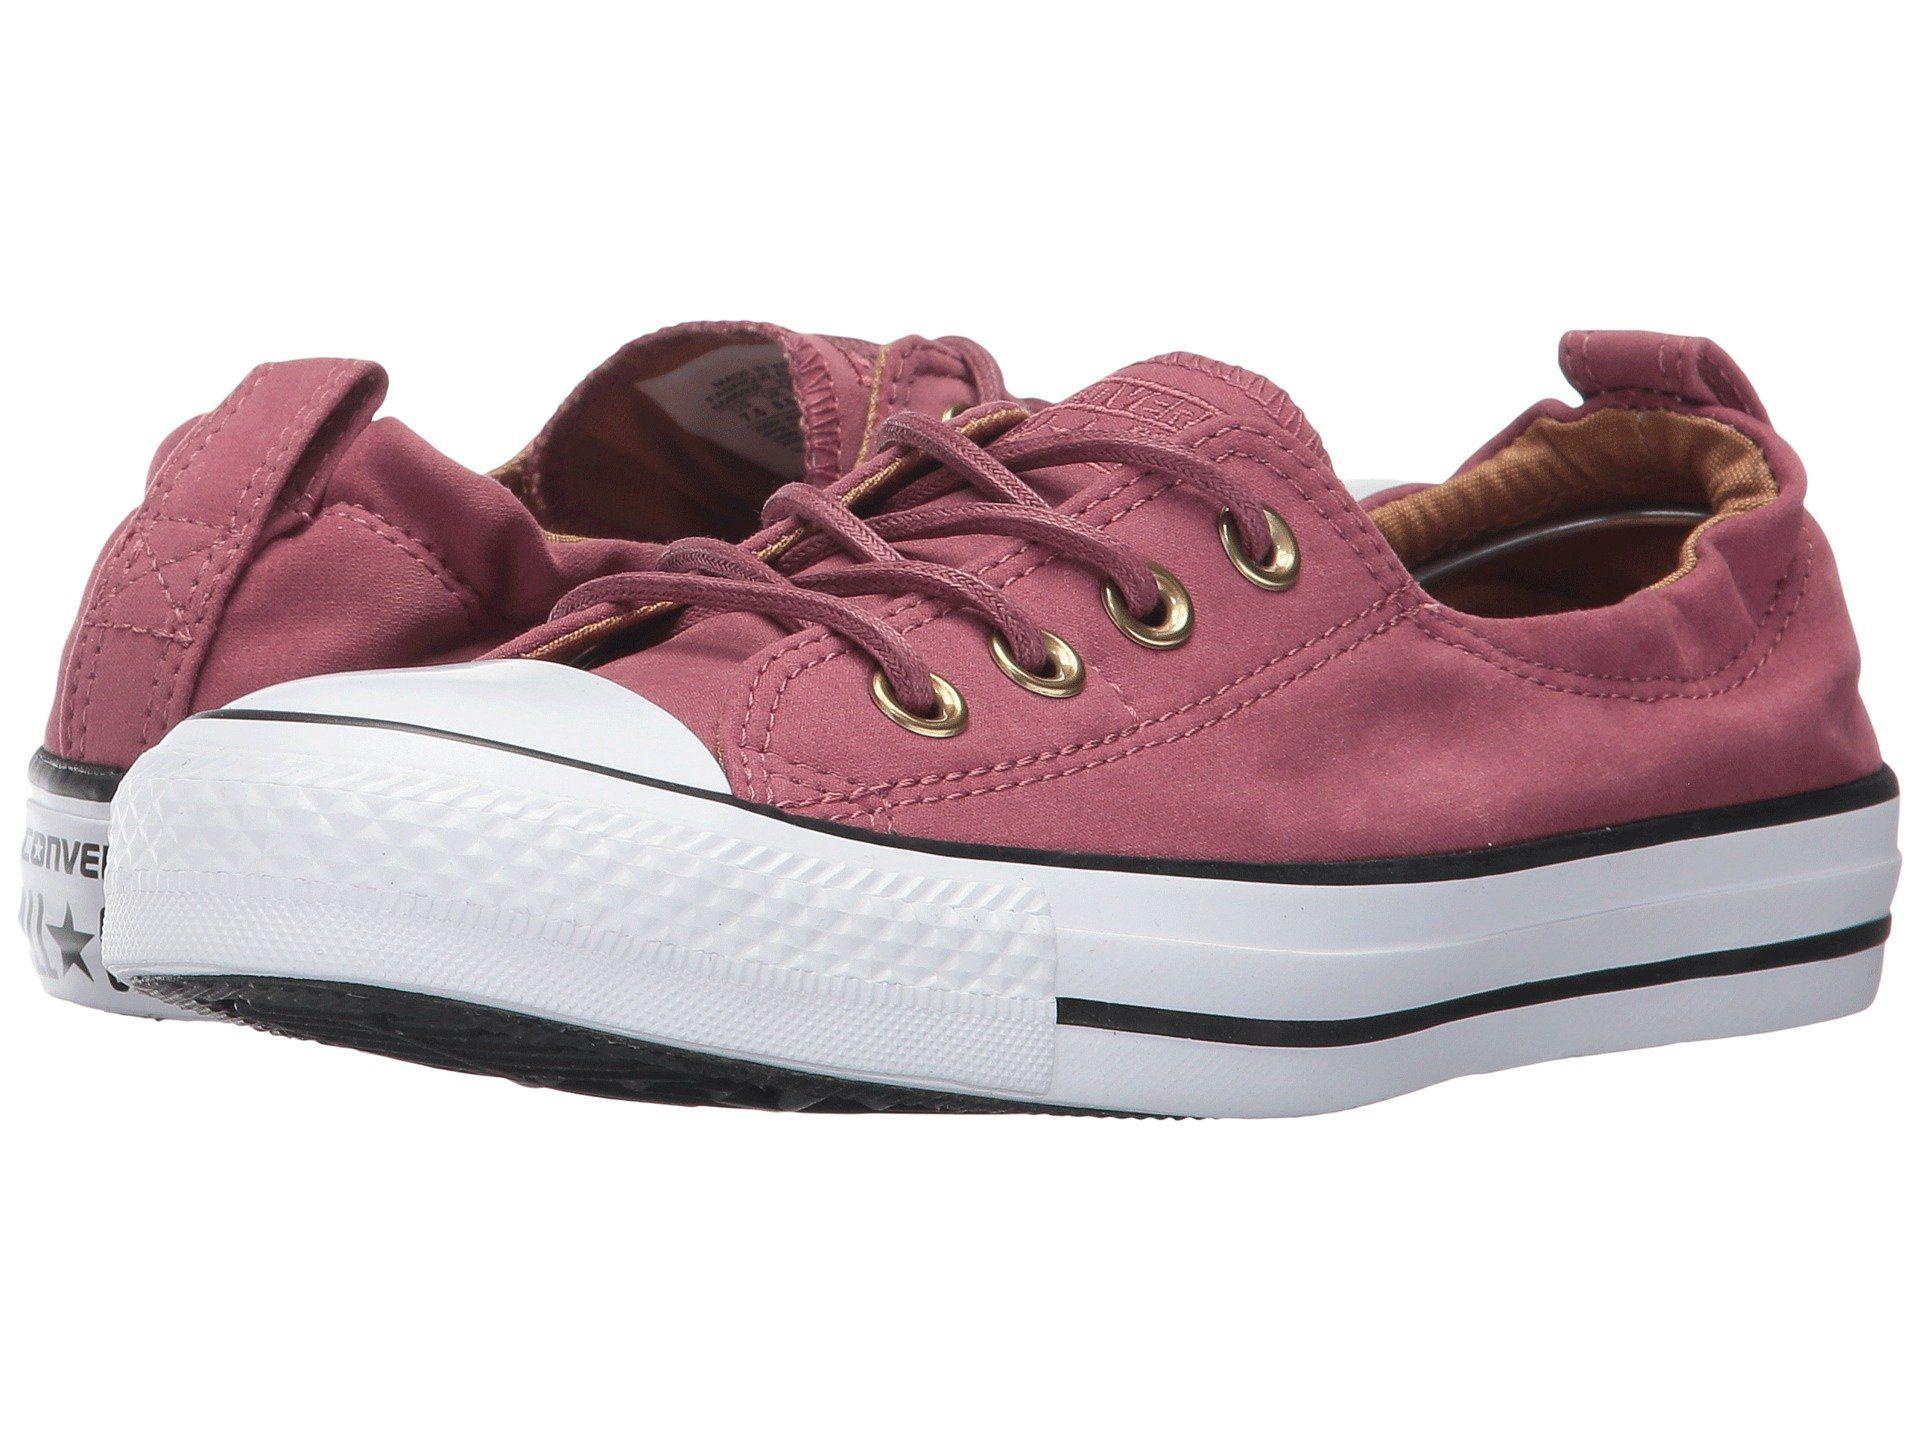 803f4790cfa2bf CONVERSE Chuck Taylor All Star Shoreline - Slip Peached Canvas.  converse   shoes